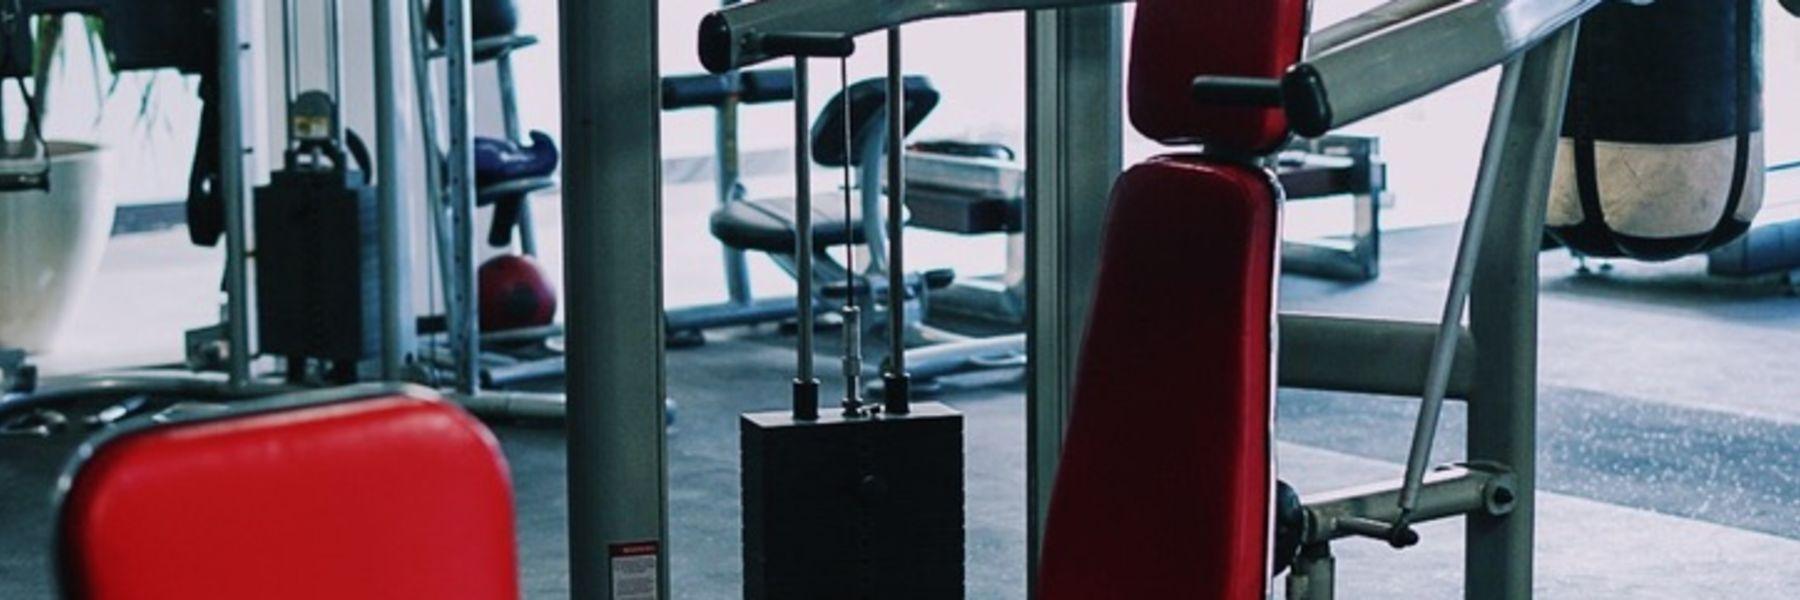 LV8 Fitness Center image